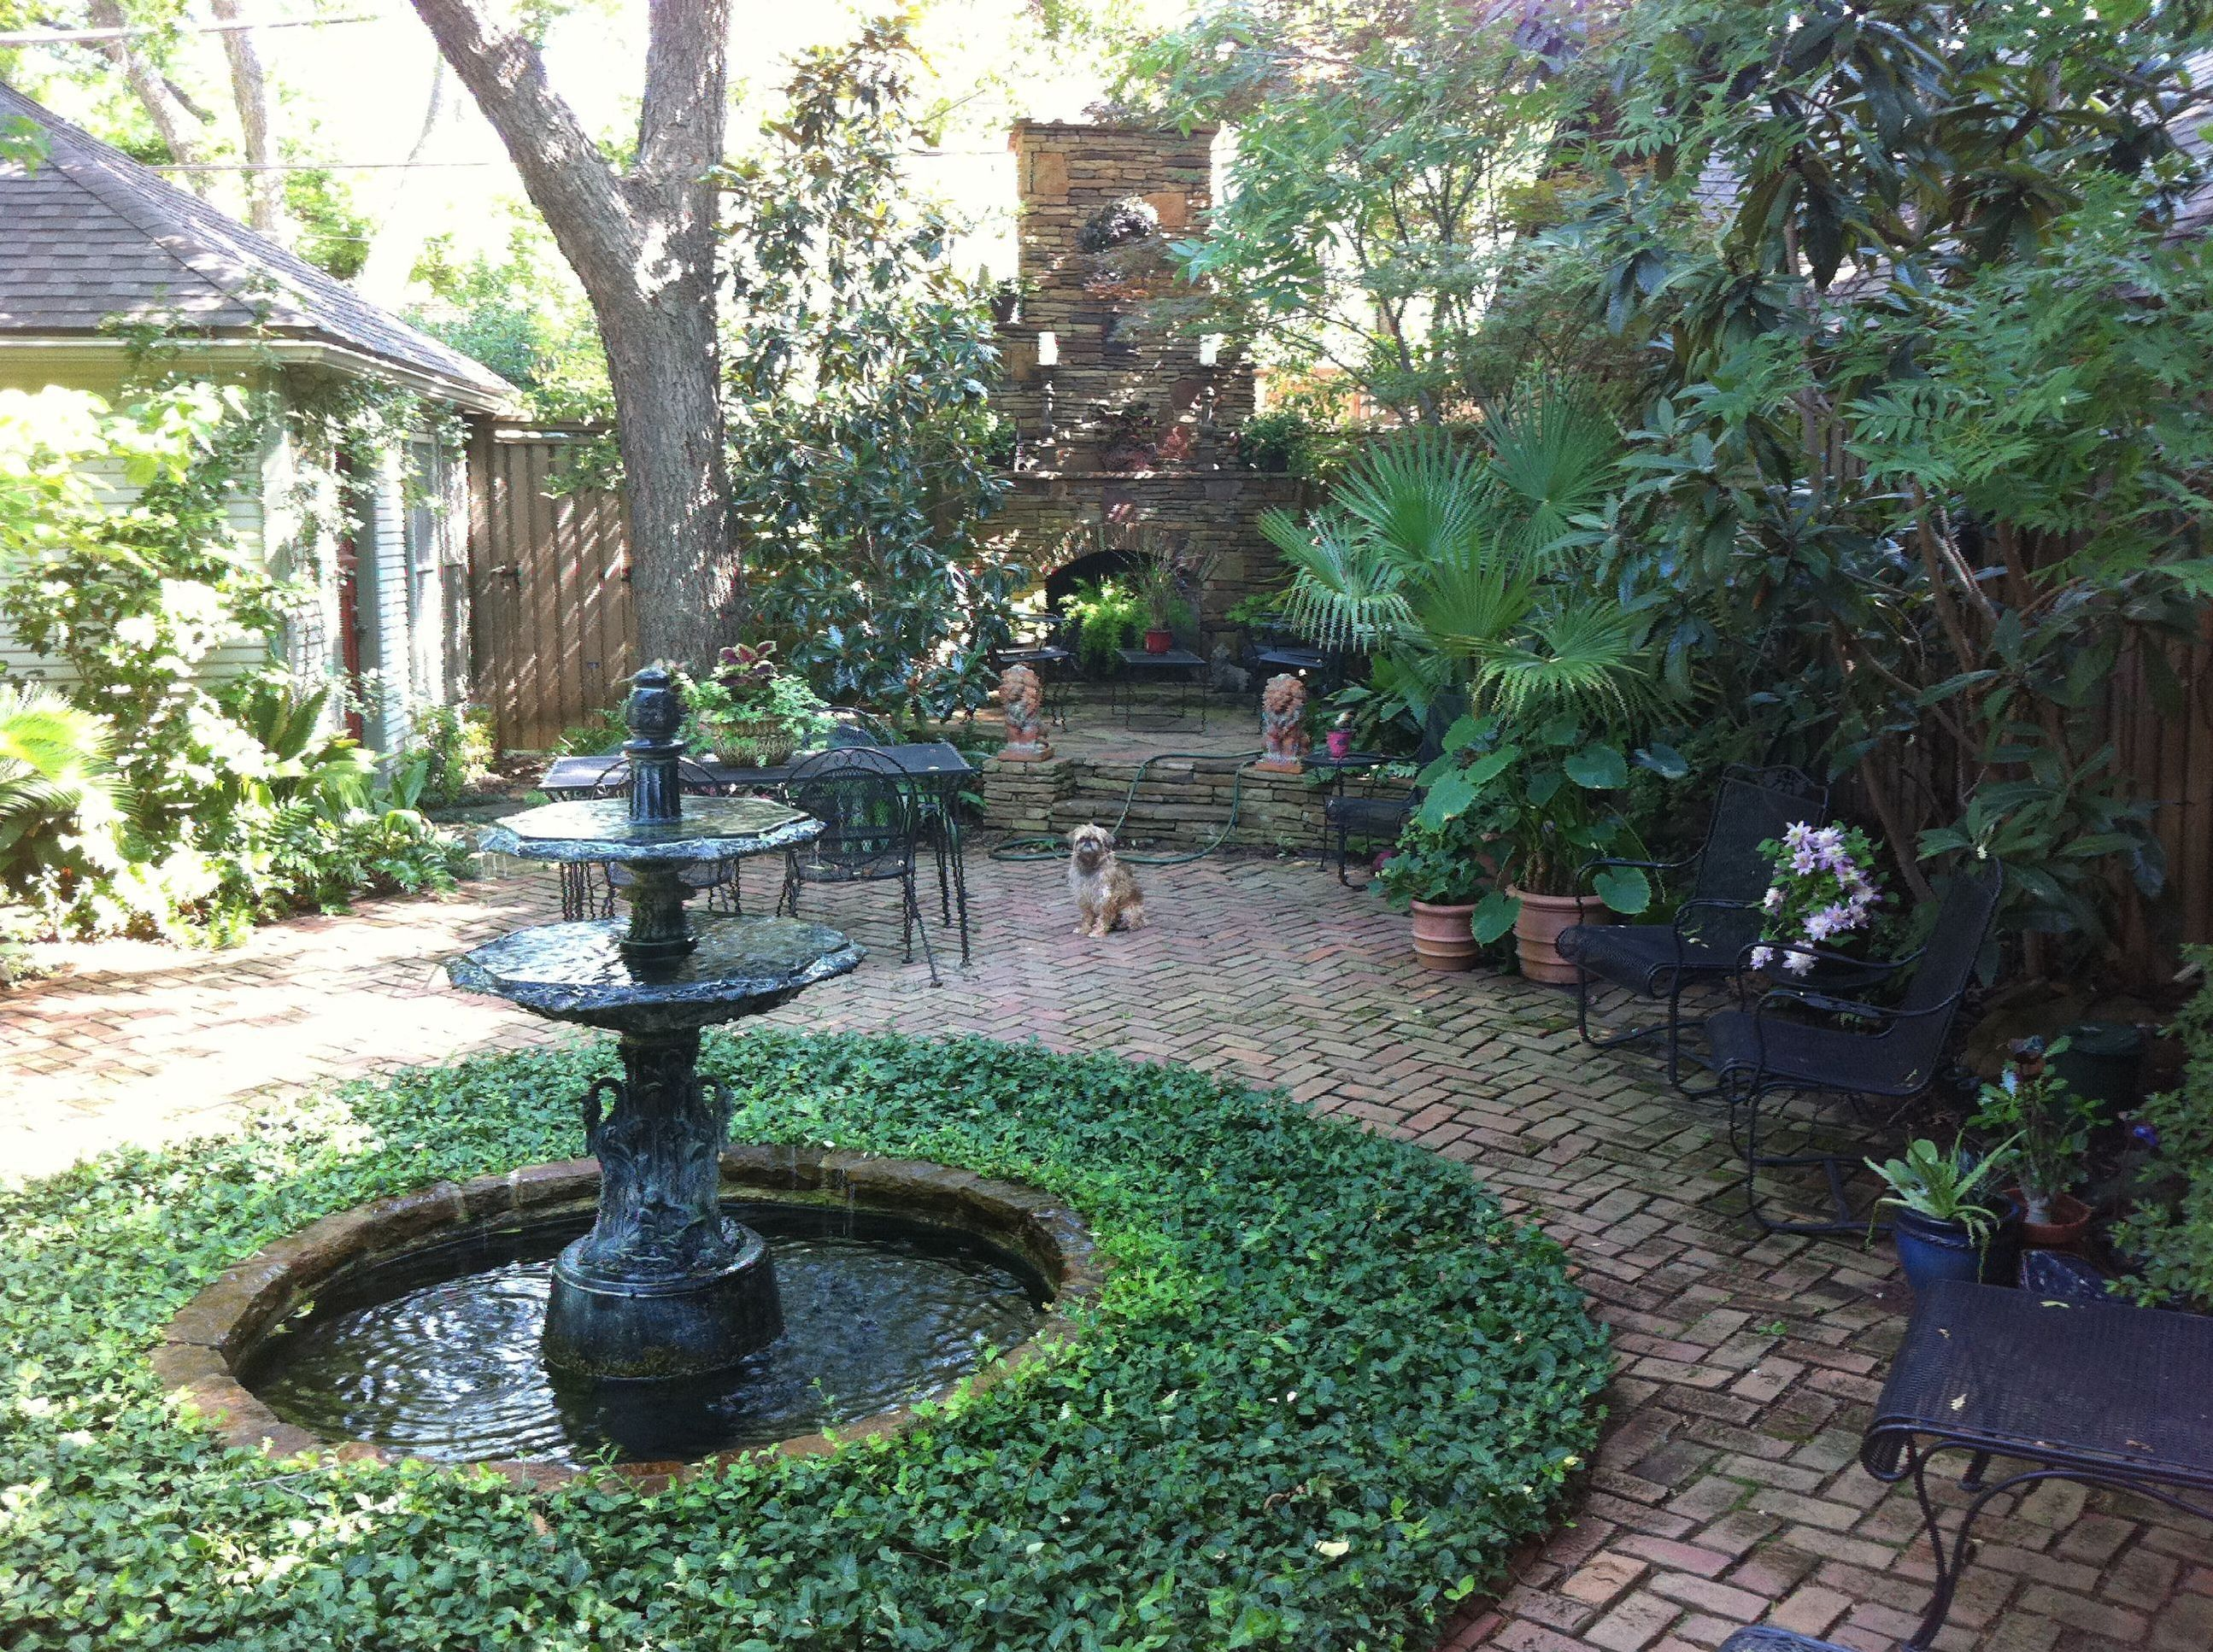 16 Best Garden Design Ideas To Make The Best Of Your Outdoor Space Courtyard Landscaping Garden Fountains Courtyard Garden